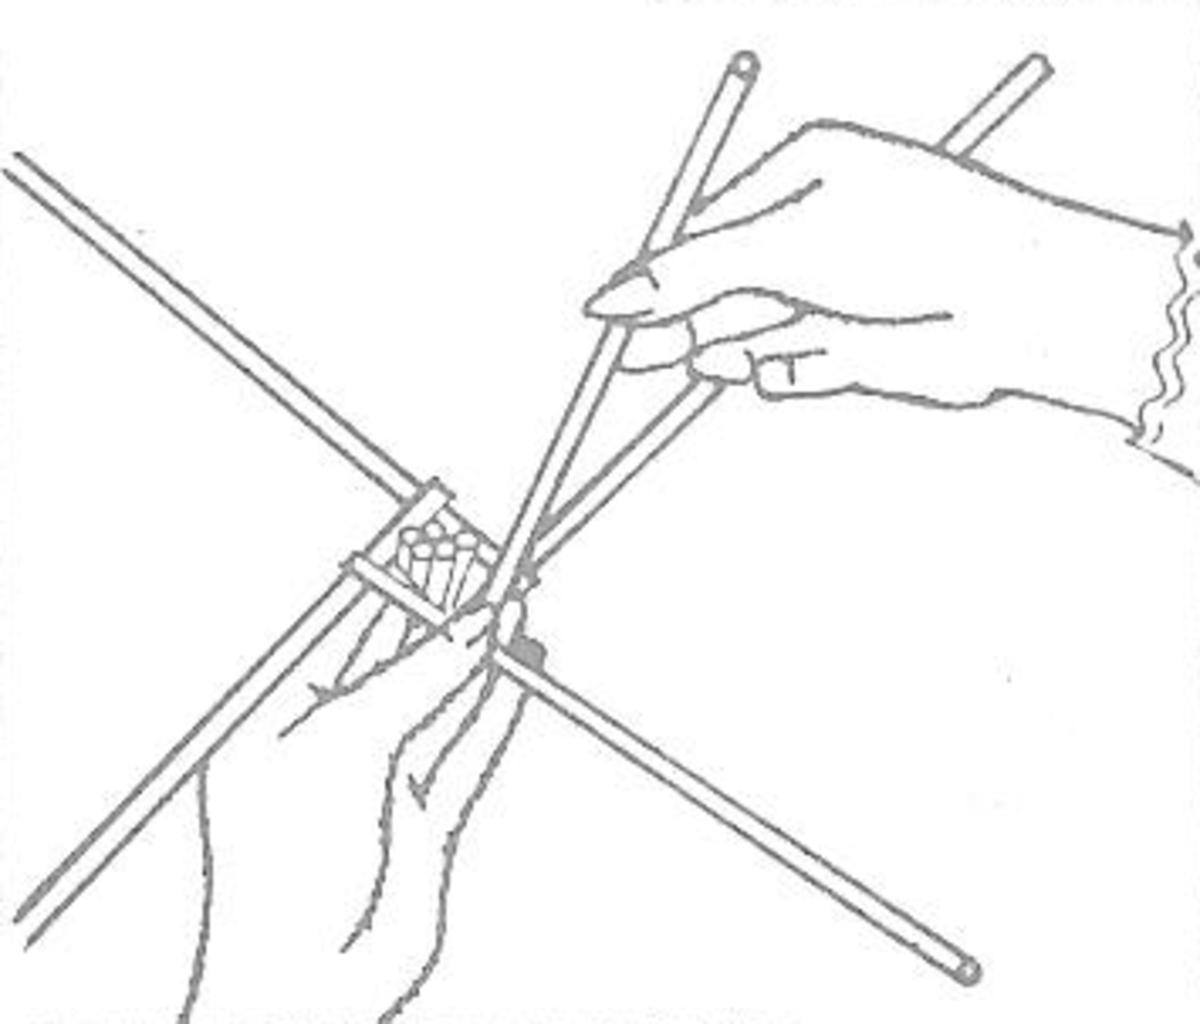 Figure 6: Reducing the Shape